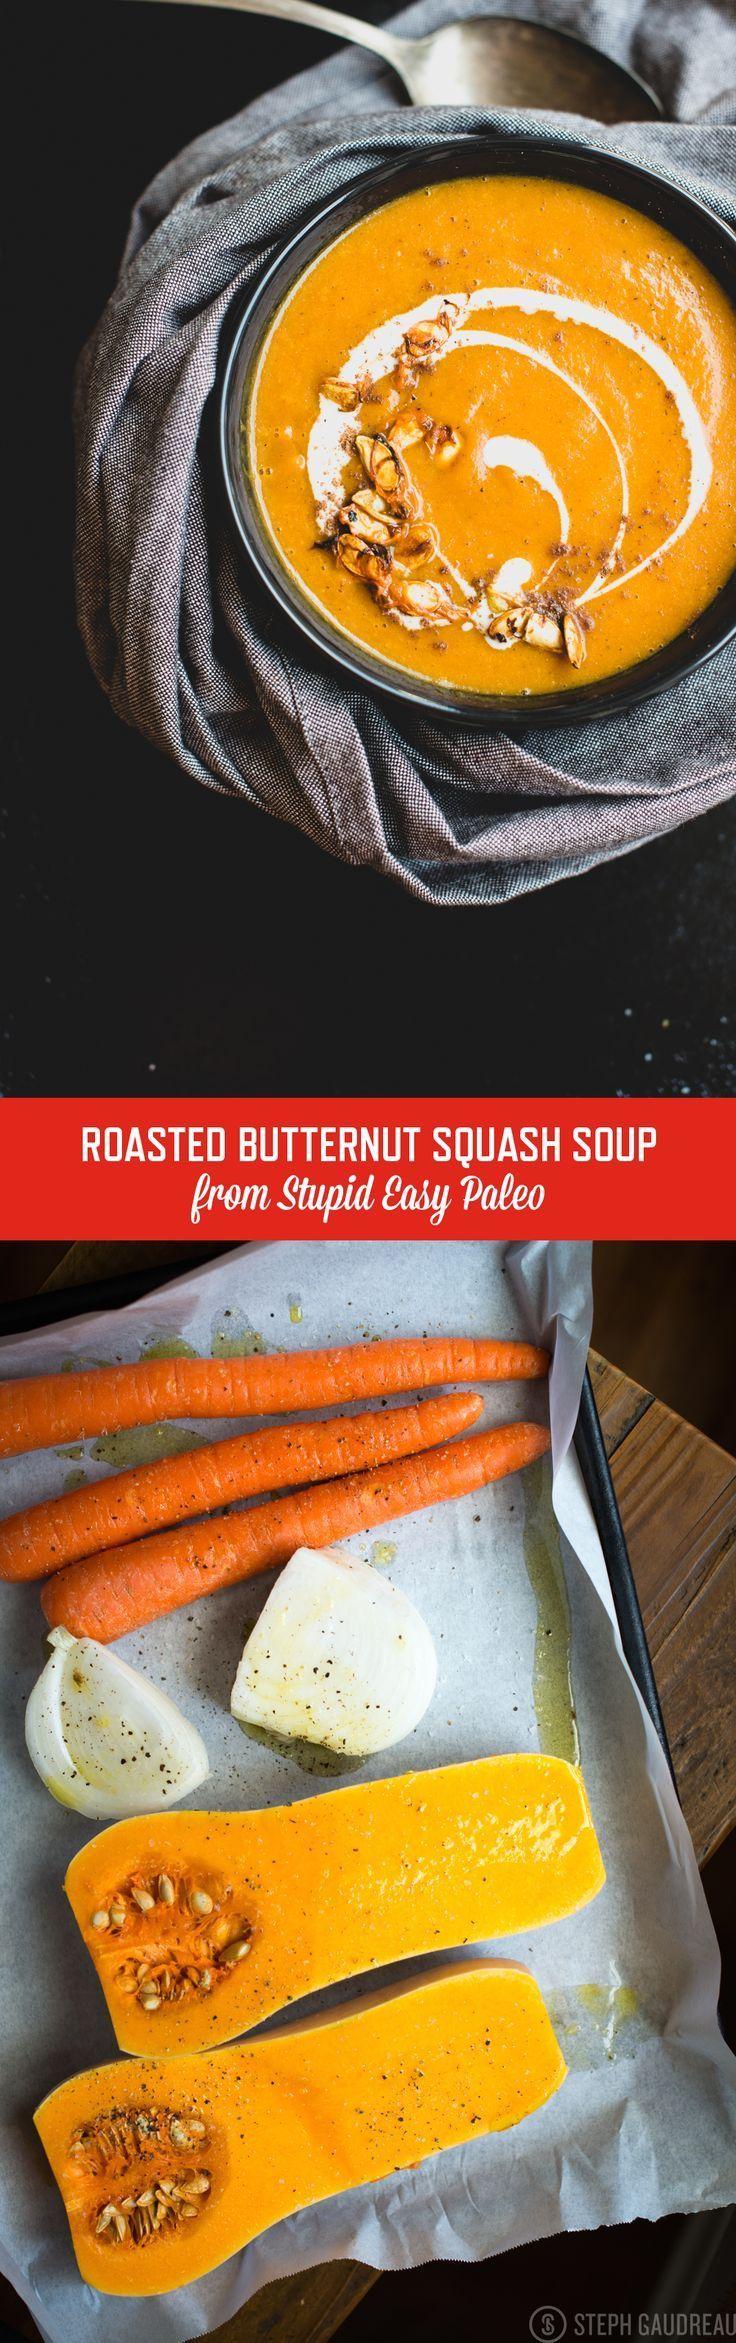 Roasted Butternut Squash Soup | http://StupidEasyPaleo.com